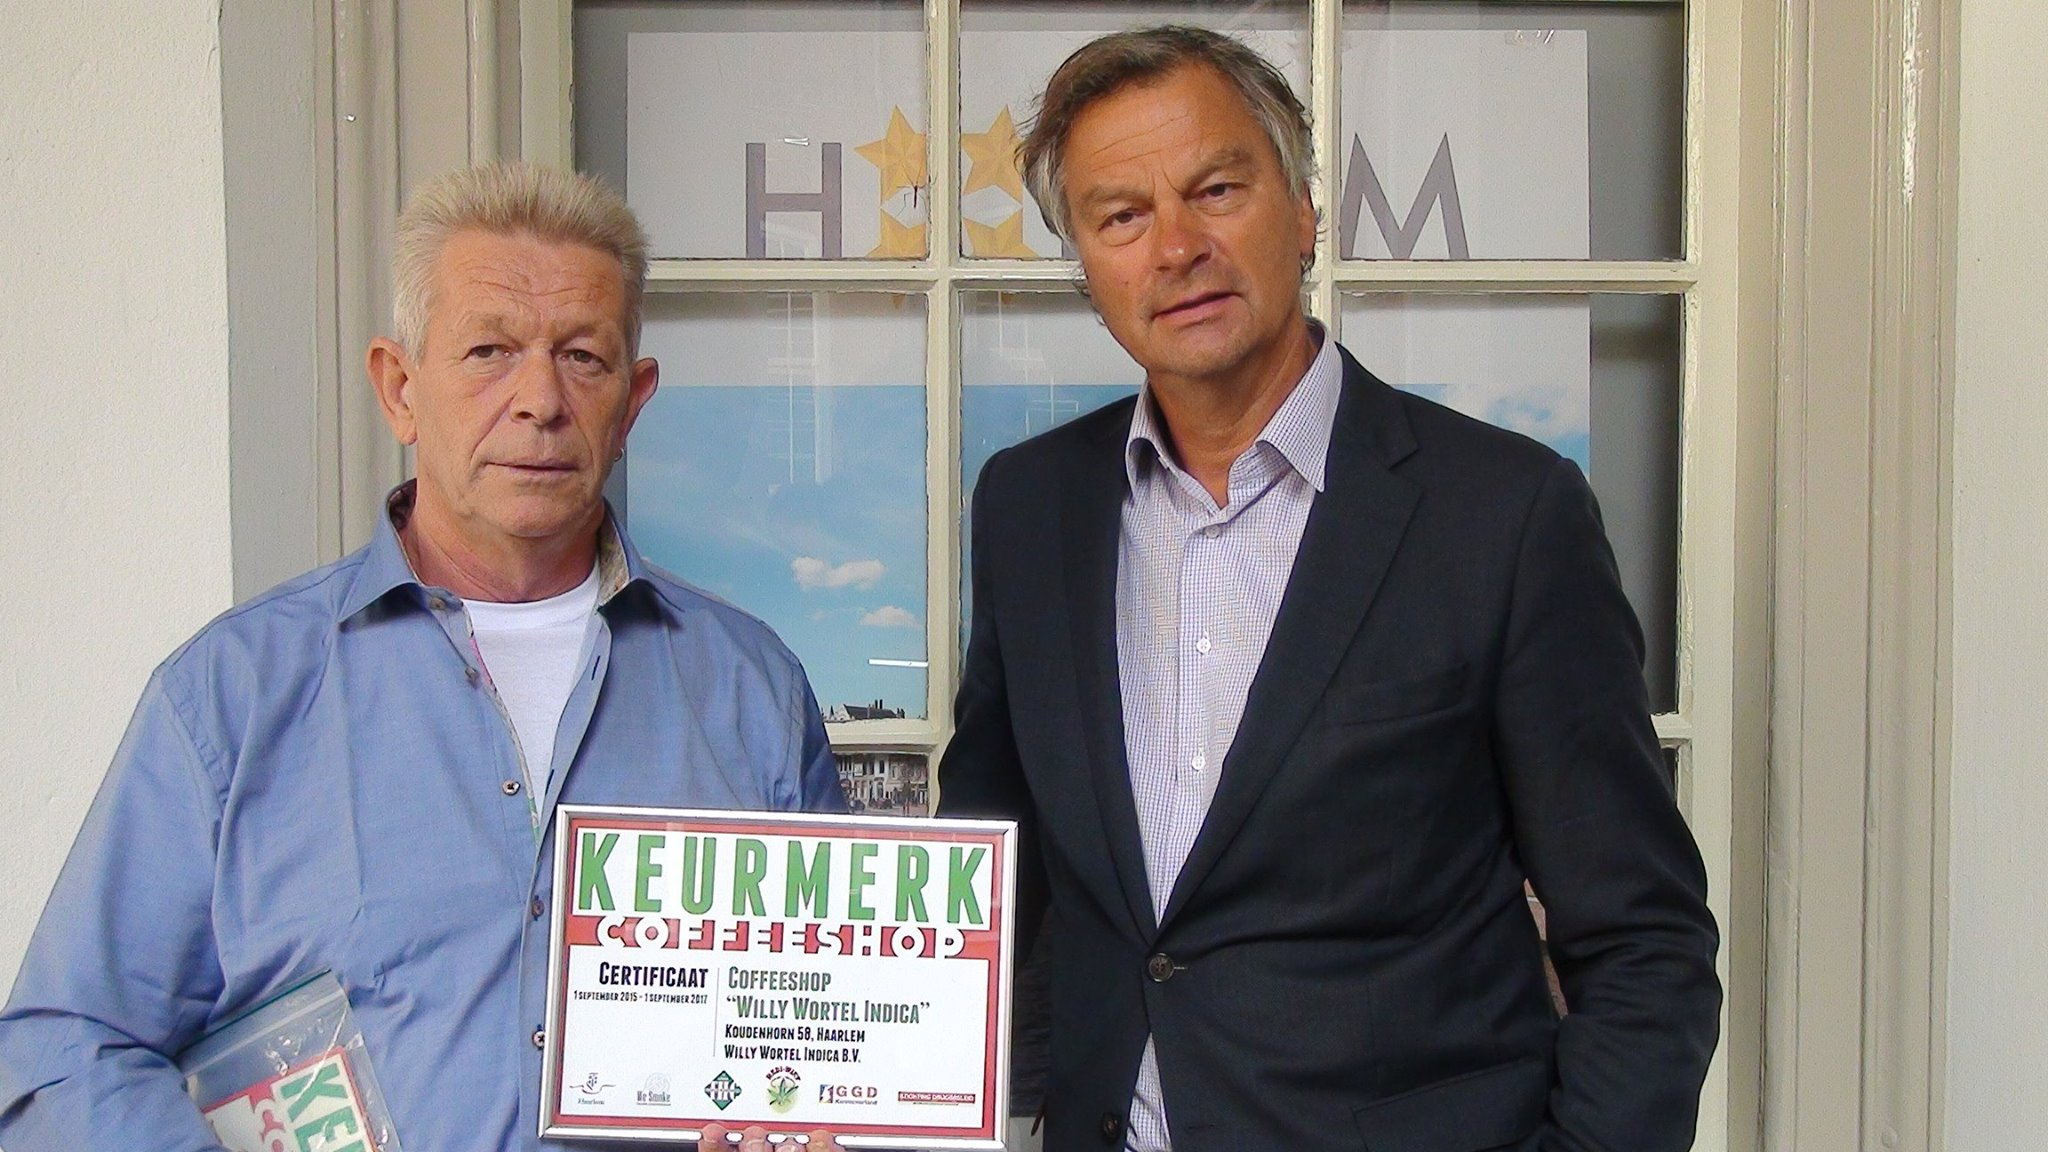 Bürgermeister meets Bürger-Meister, Foto: E.m. Donk